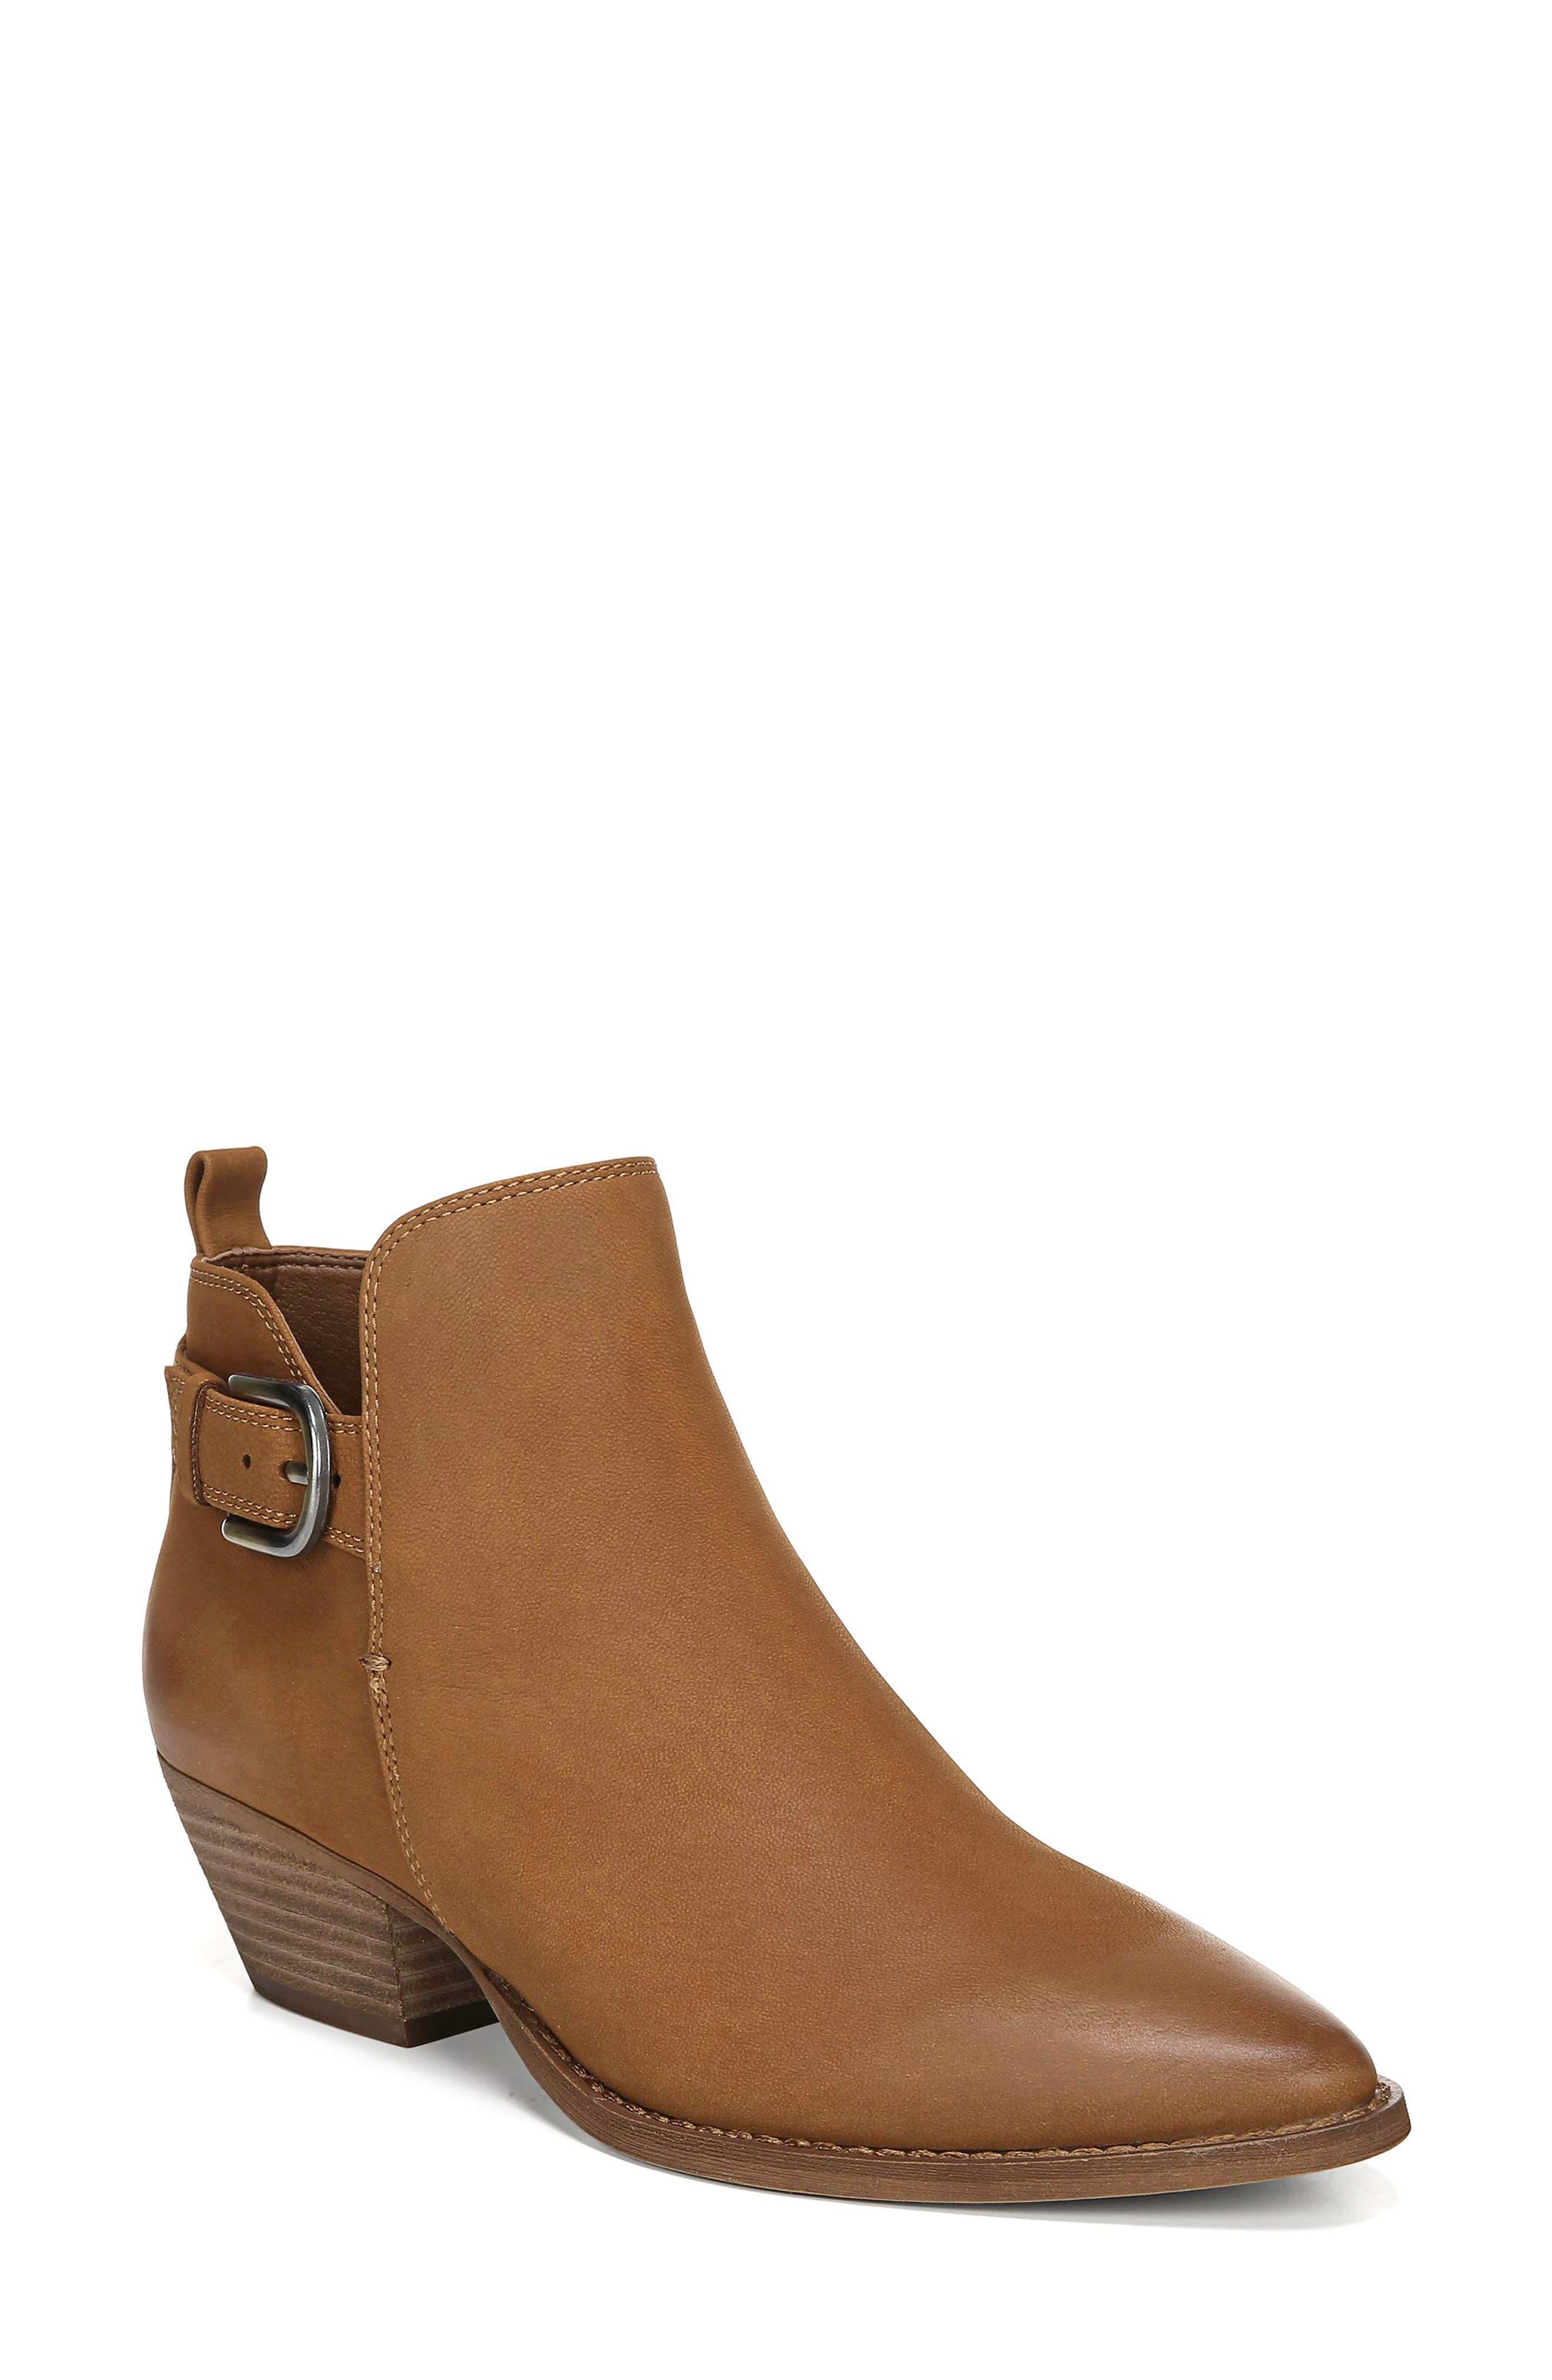 Image of Sam Edelman Neena Leather Buckle Boot